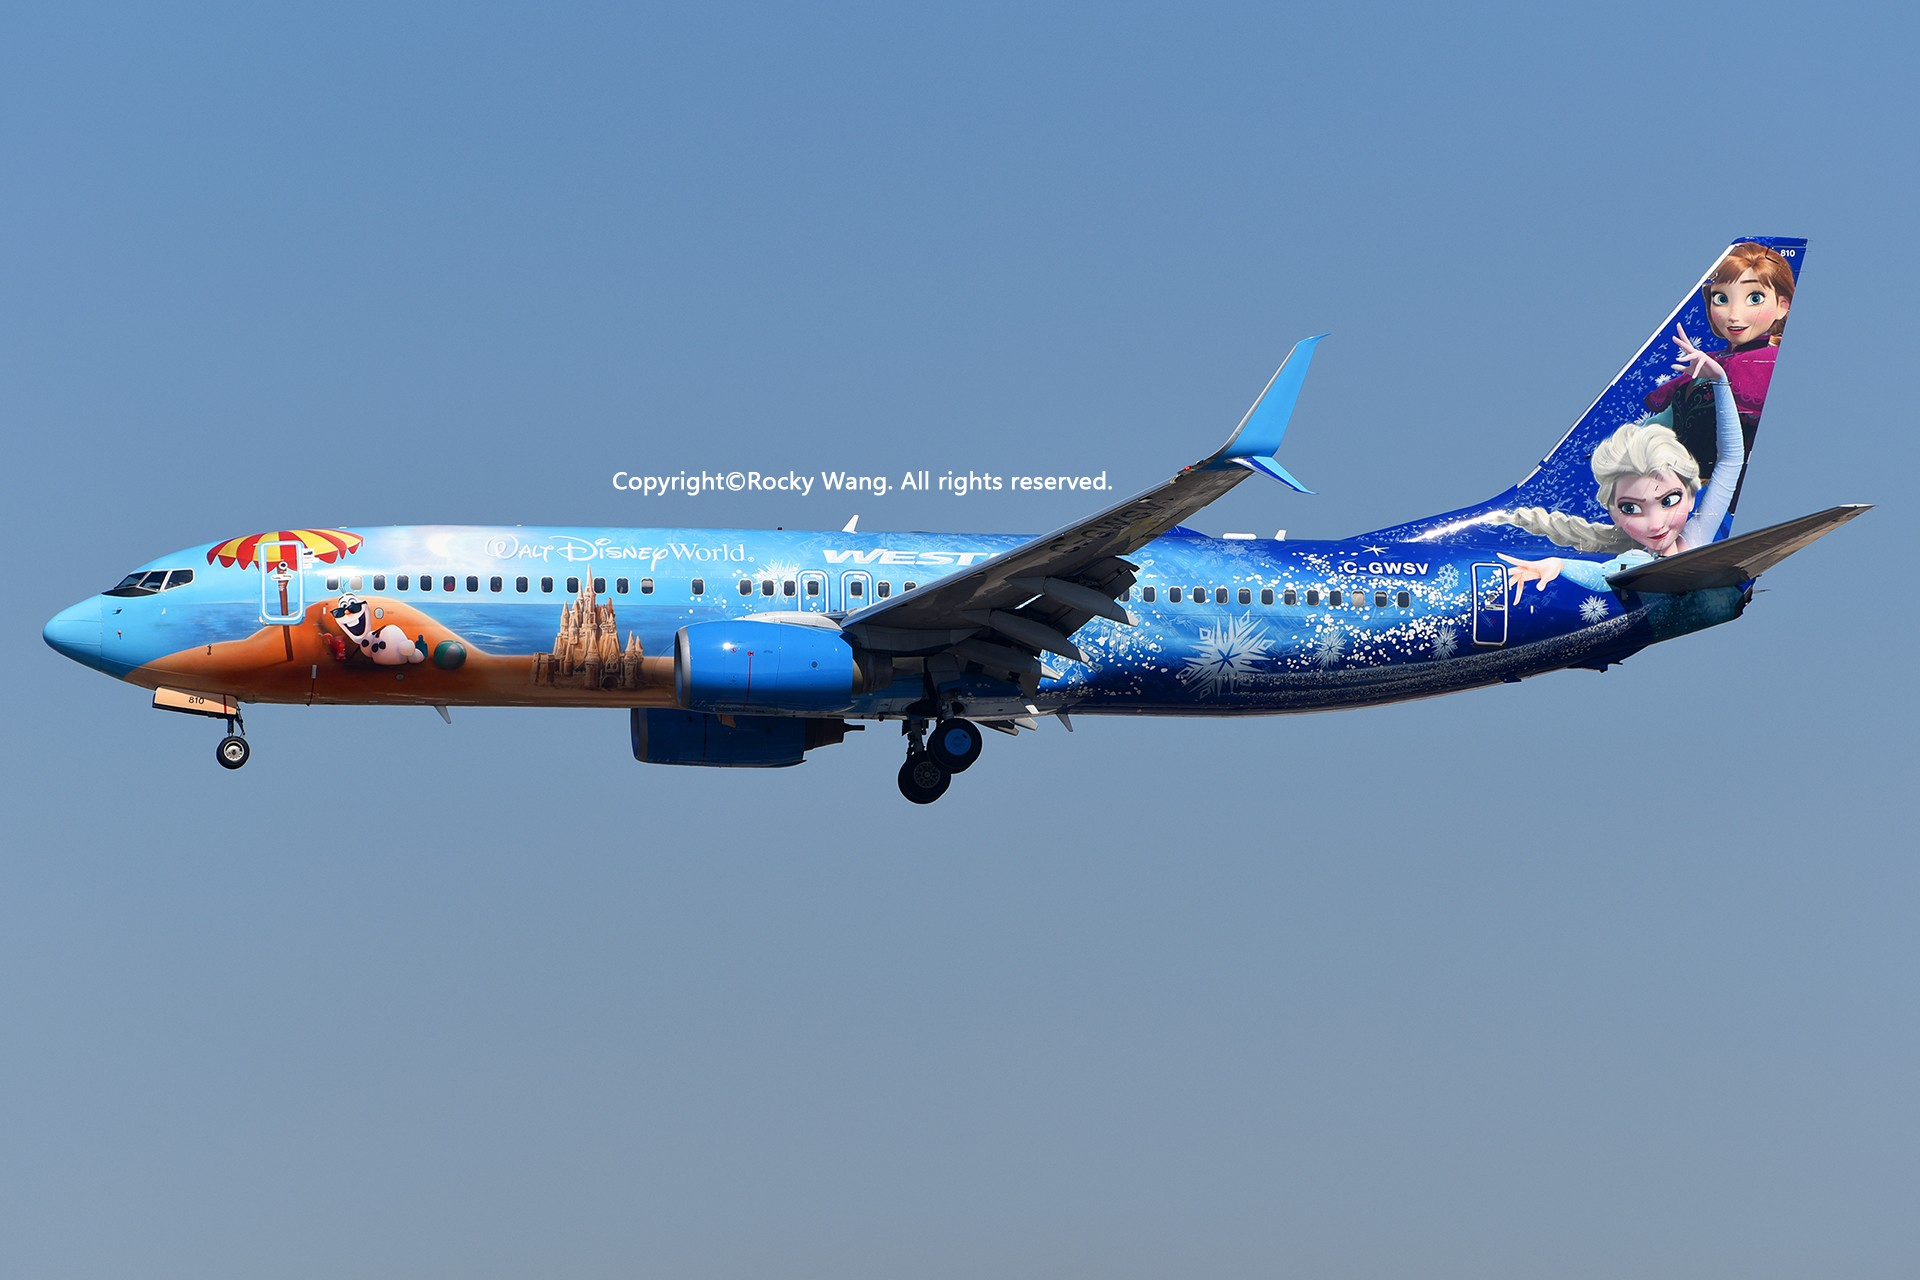 Re:[原创]彩绘圣地-附加彩蛋 BOEING 737-8CT C-GWSV Los Angeles Int'l Airport